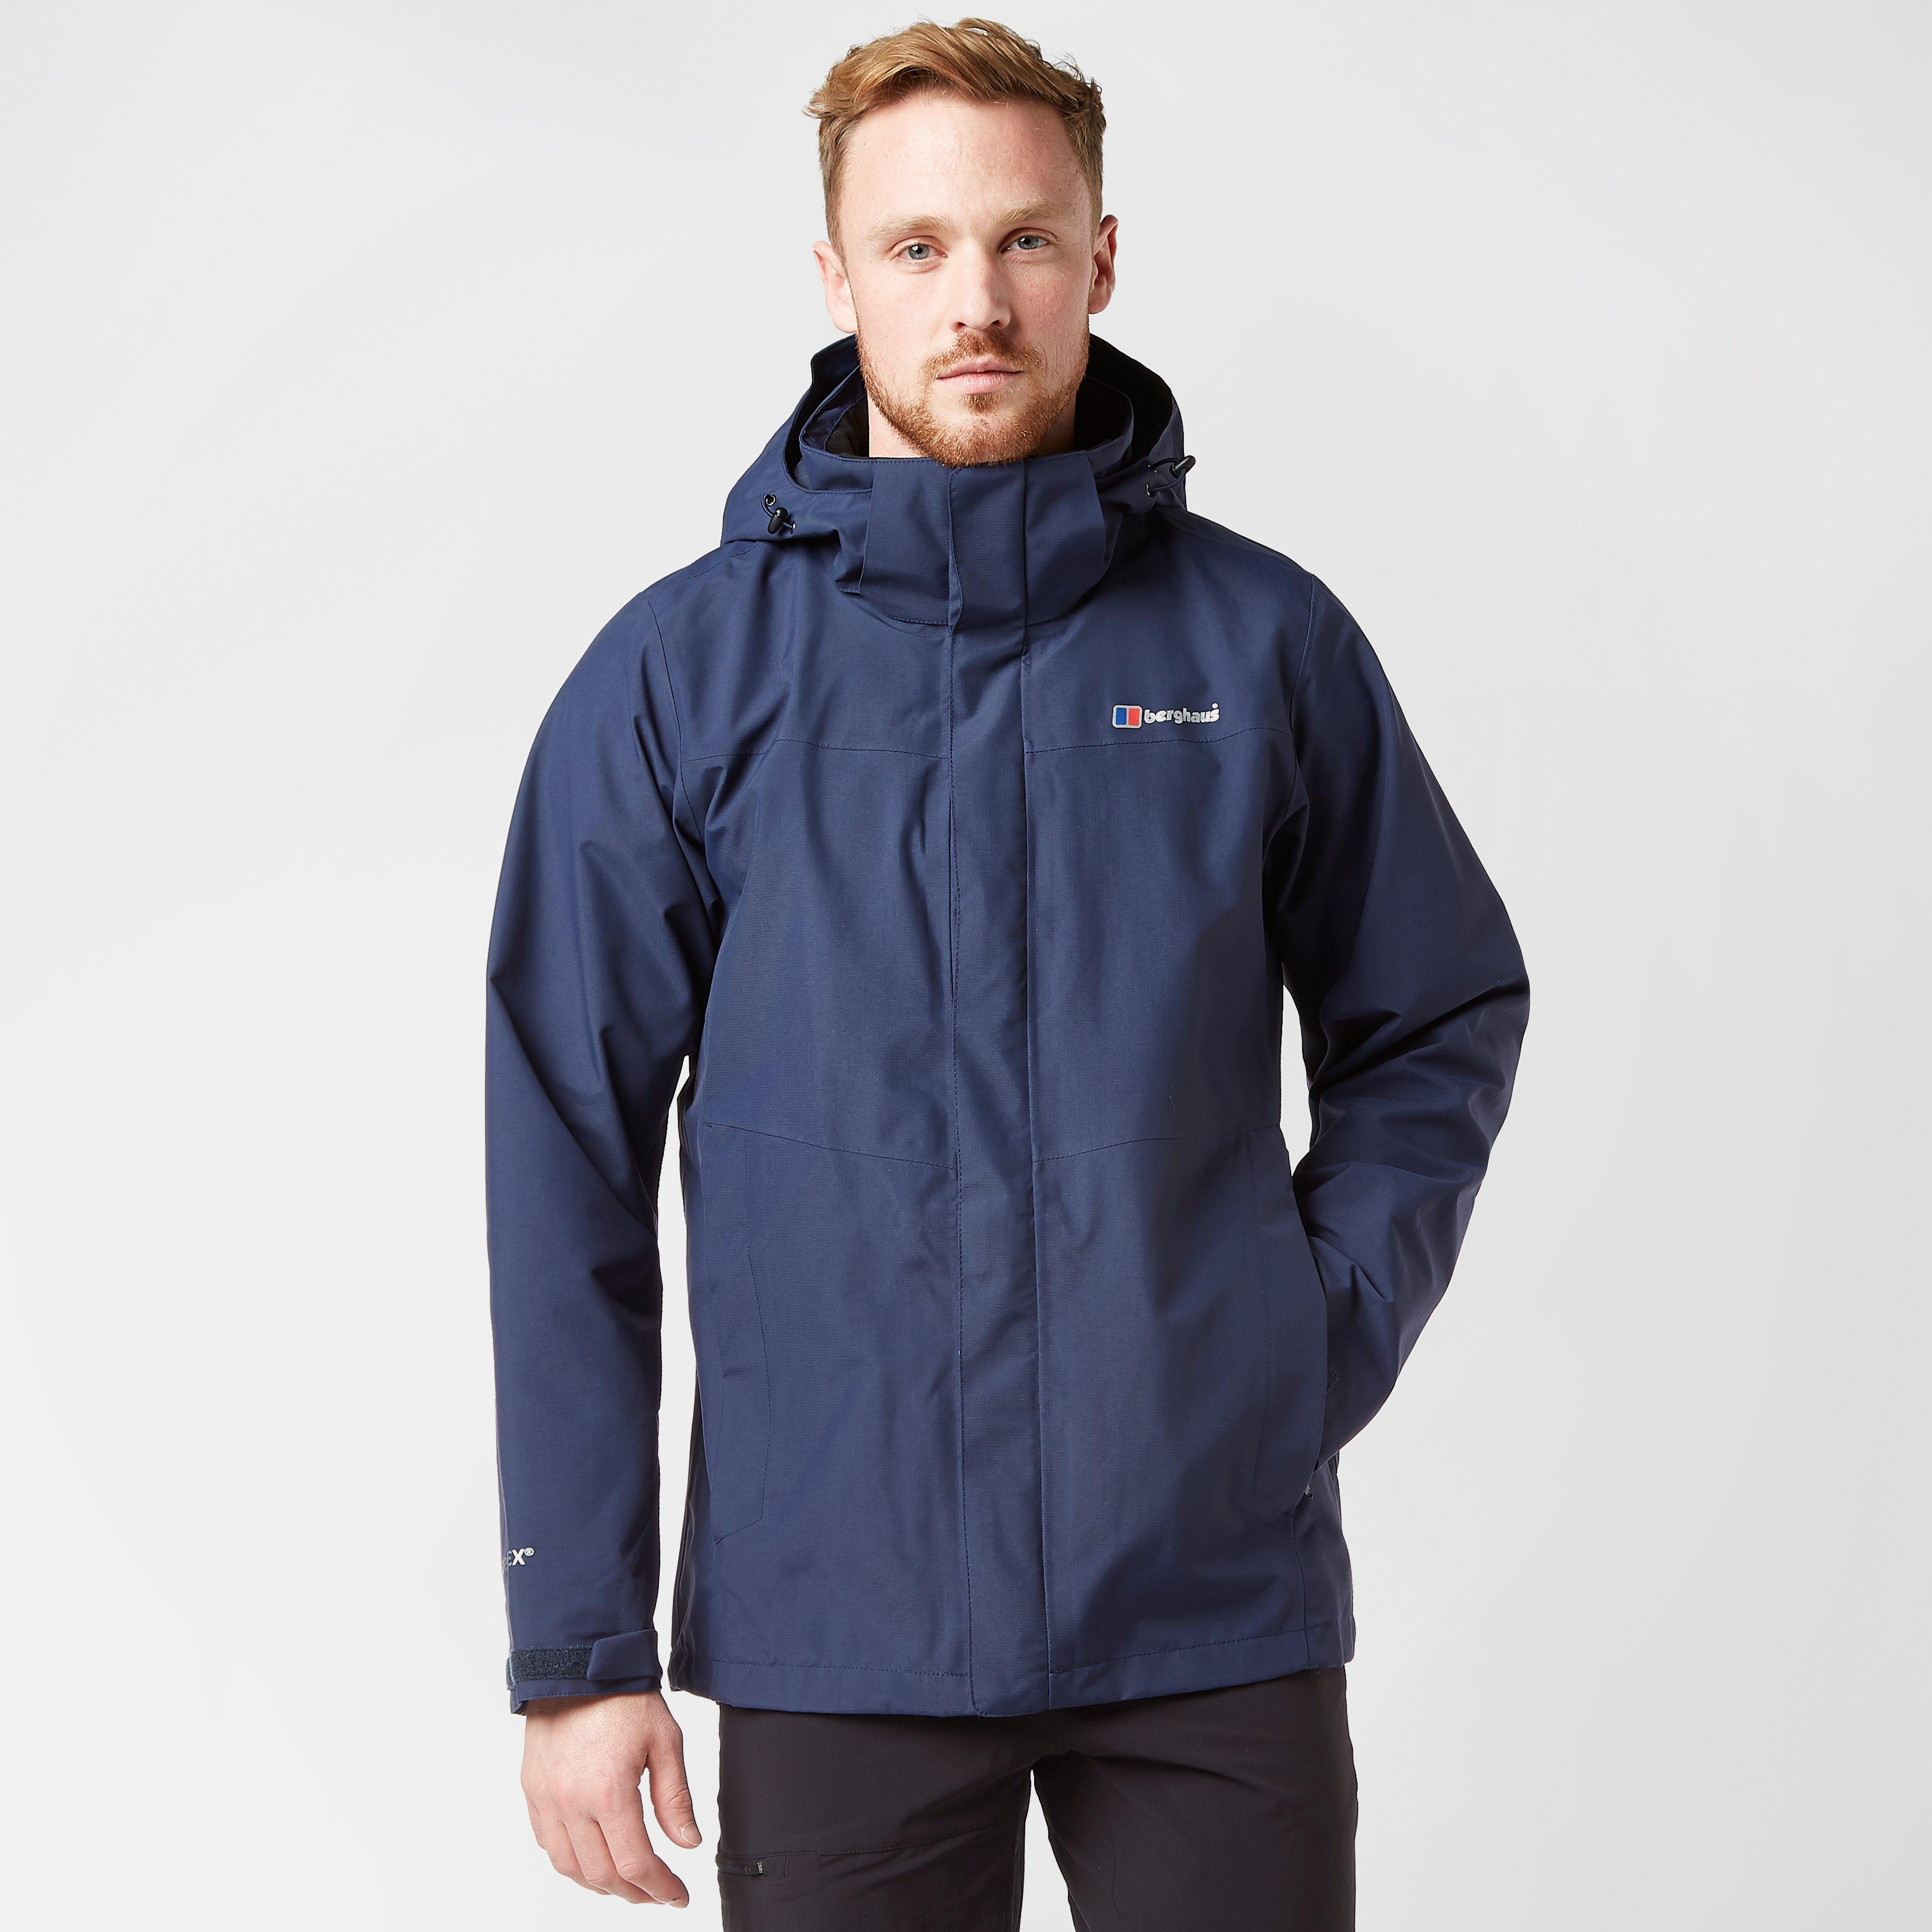 Berghaus Maitland Gore-Tex Mens Jacket